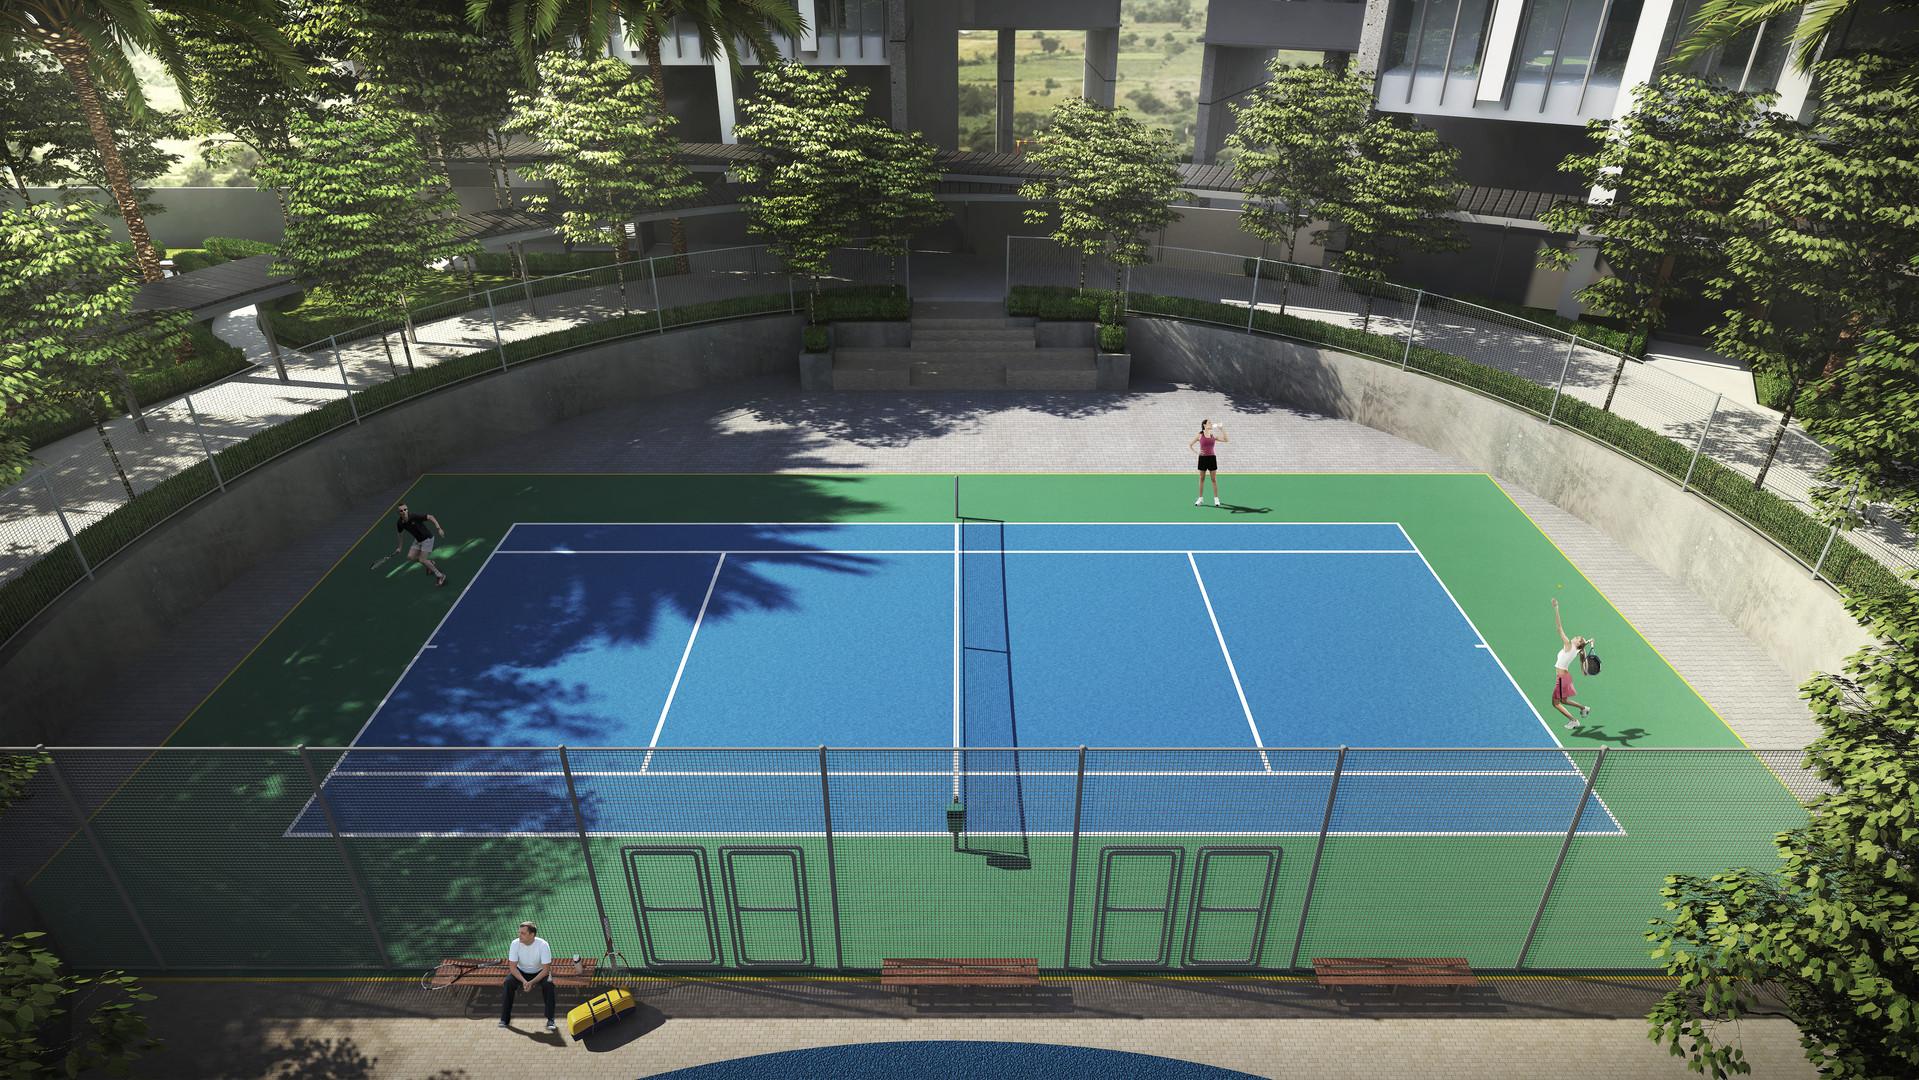 Lumi_Stills_TennisCourt_HR.jpg